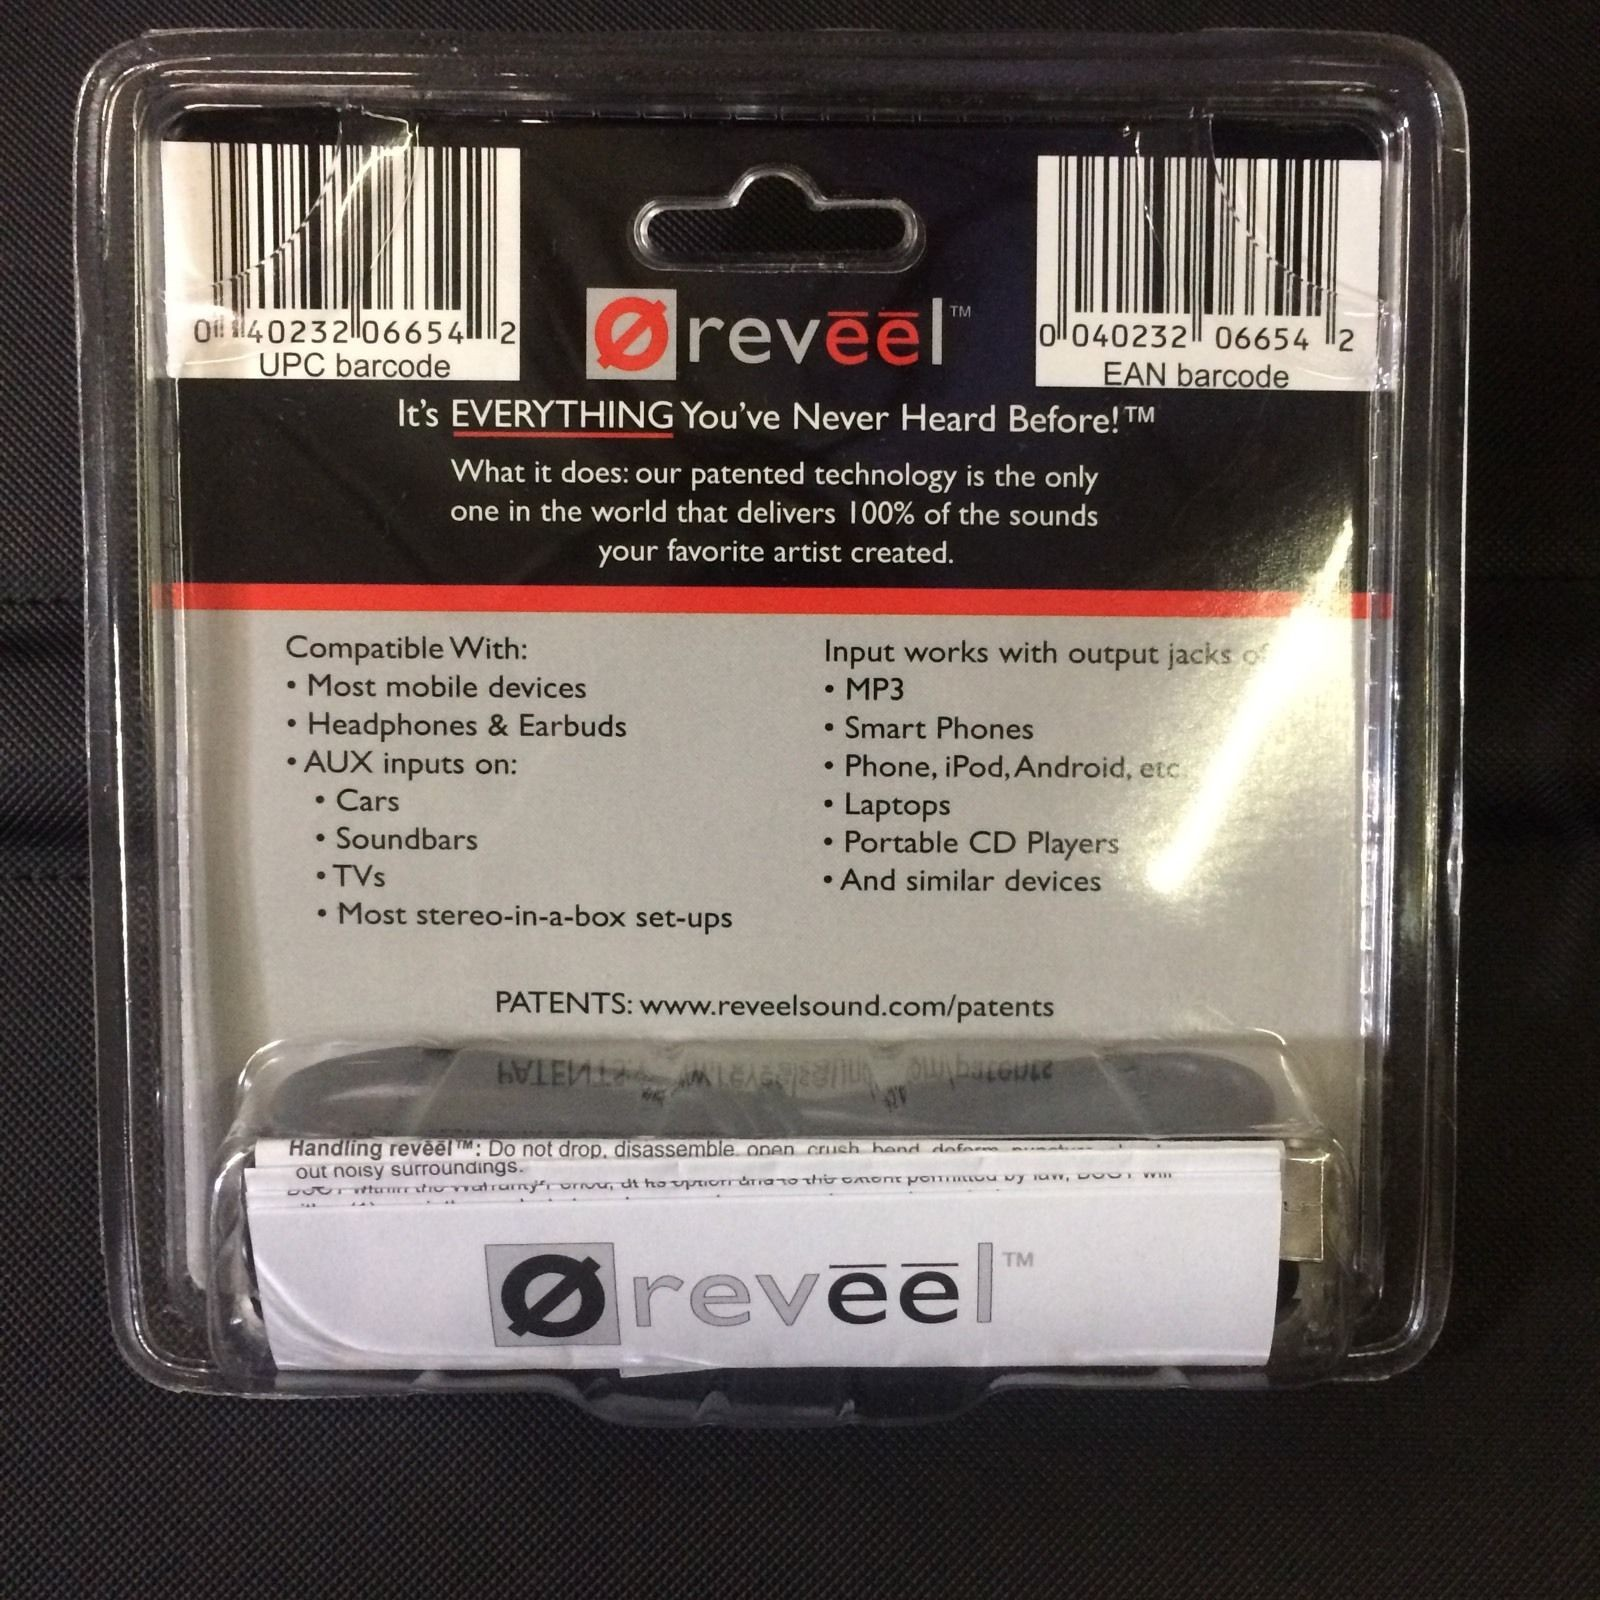 101641-BSG Technologies REVEEL BSGT R213 Portable Headphone Amplifier - Brand New-image